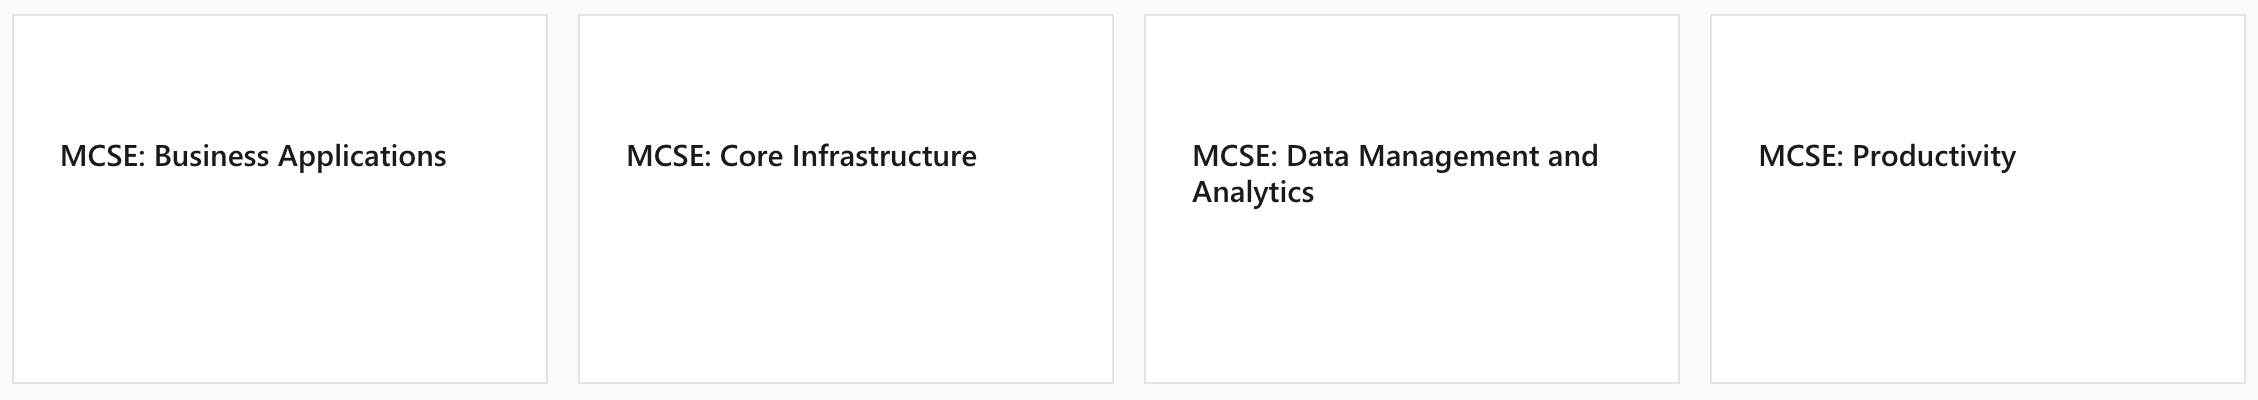 Microsoft MCSE Certifications